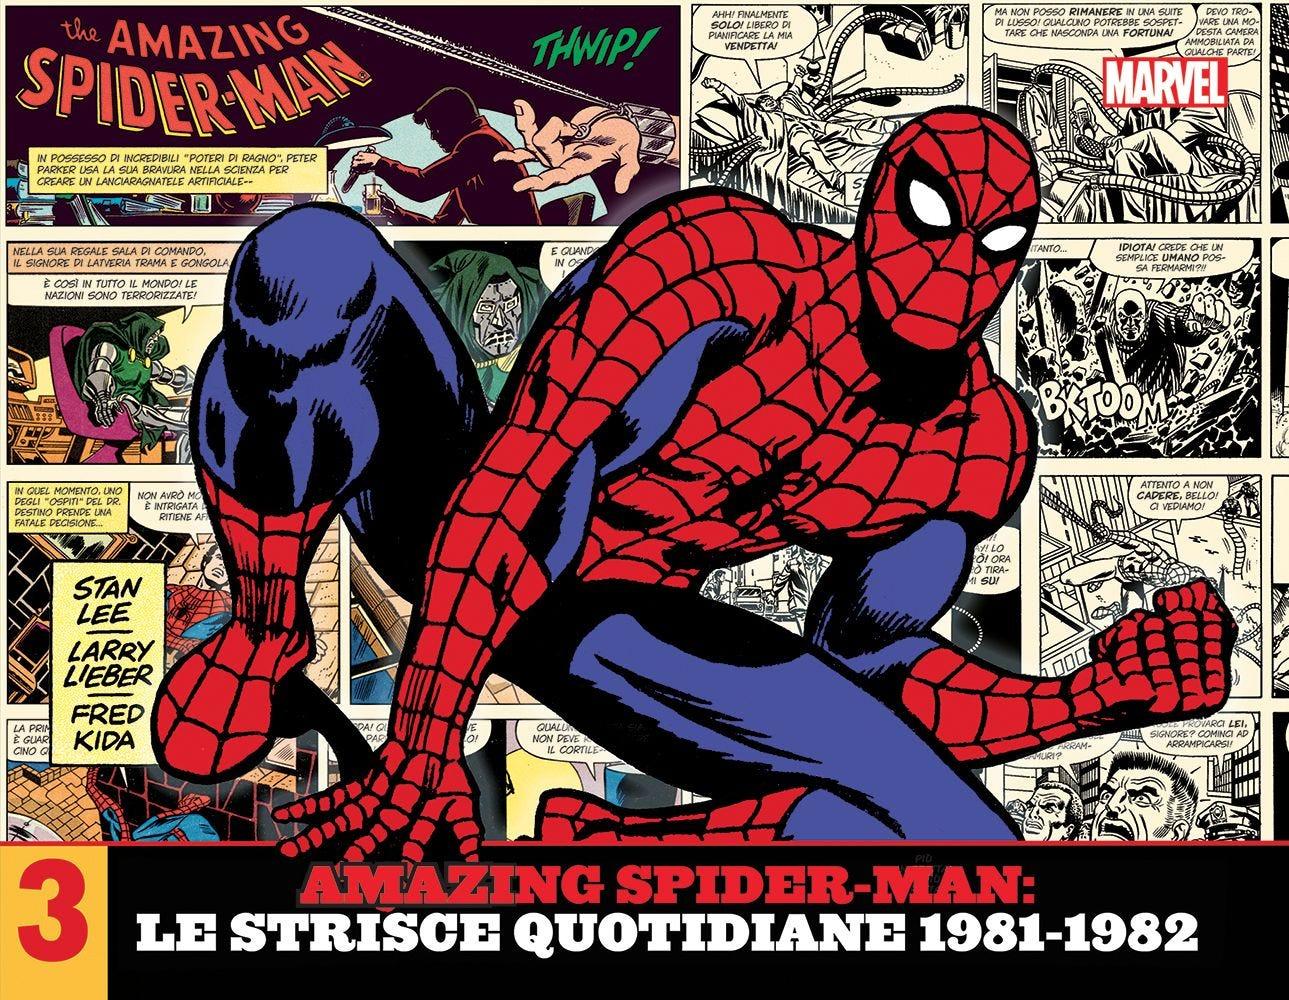 Amazing Spider-Man: Le Strisce Quotidiane 1981-1982 Raccolte in Volume magazines